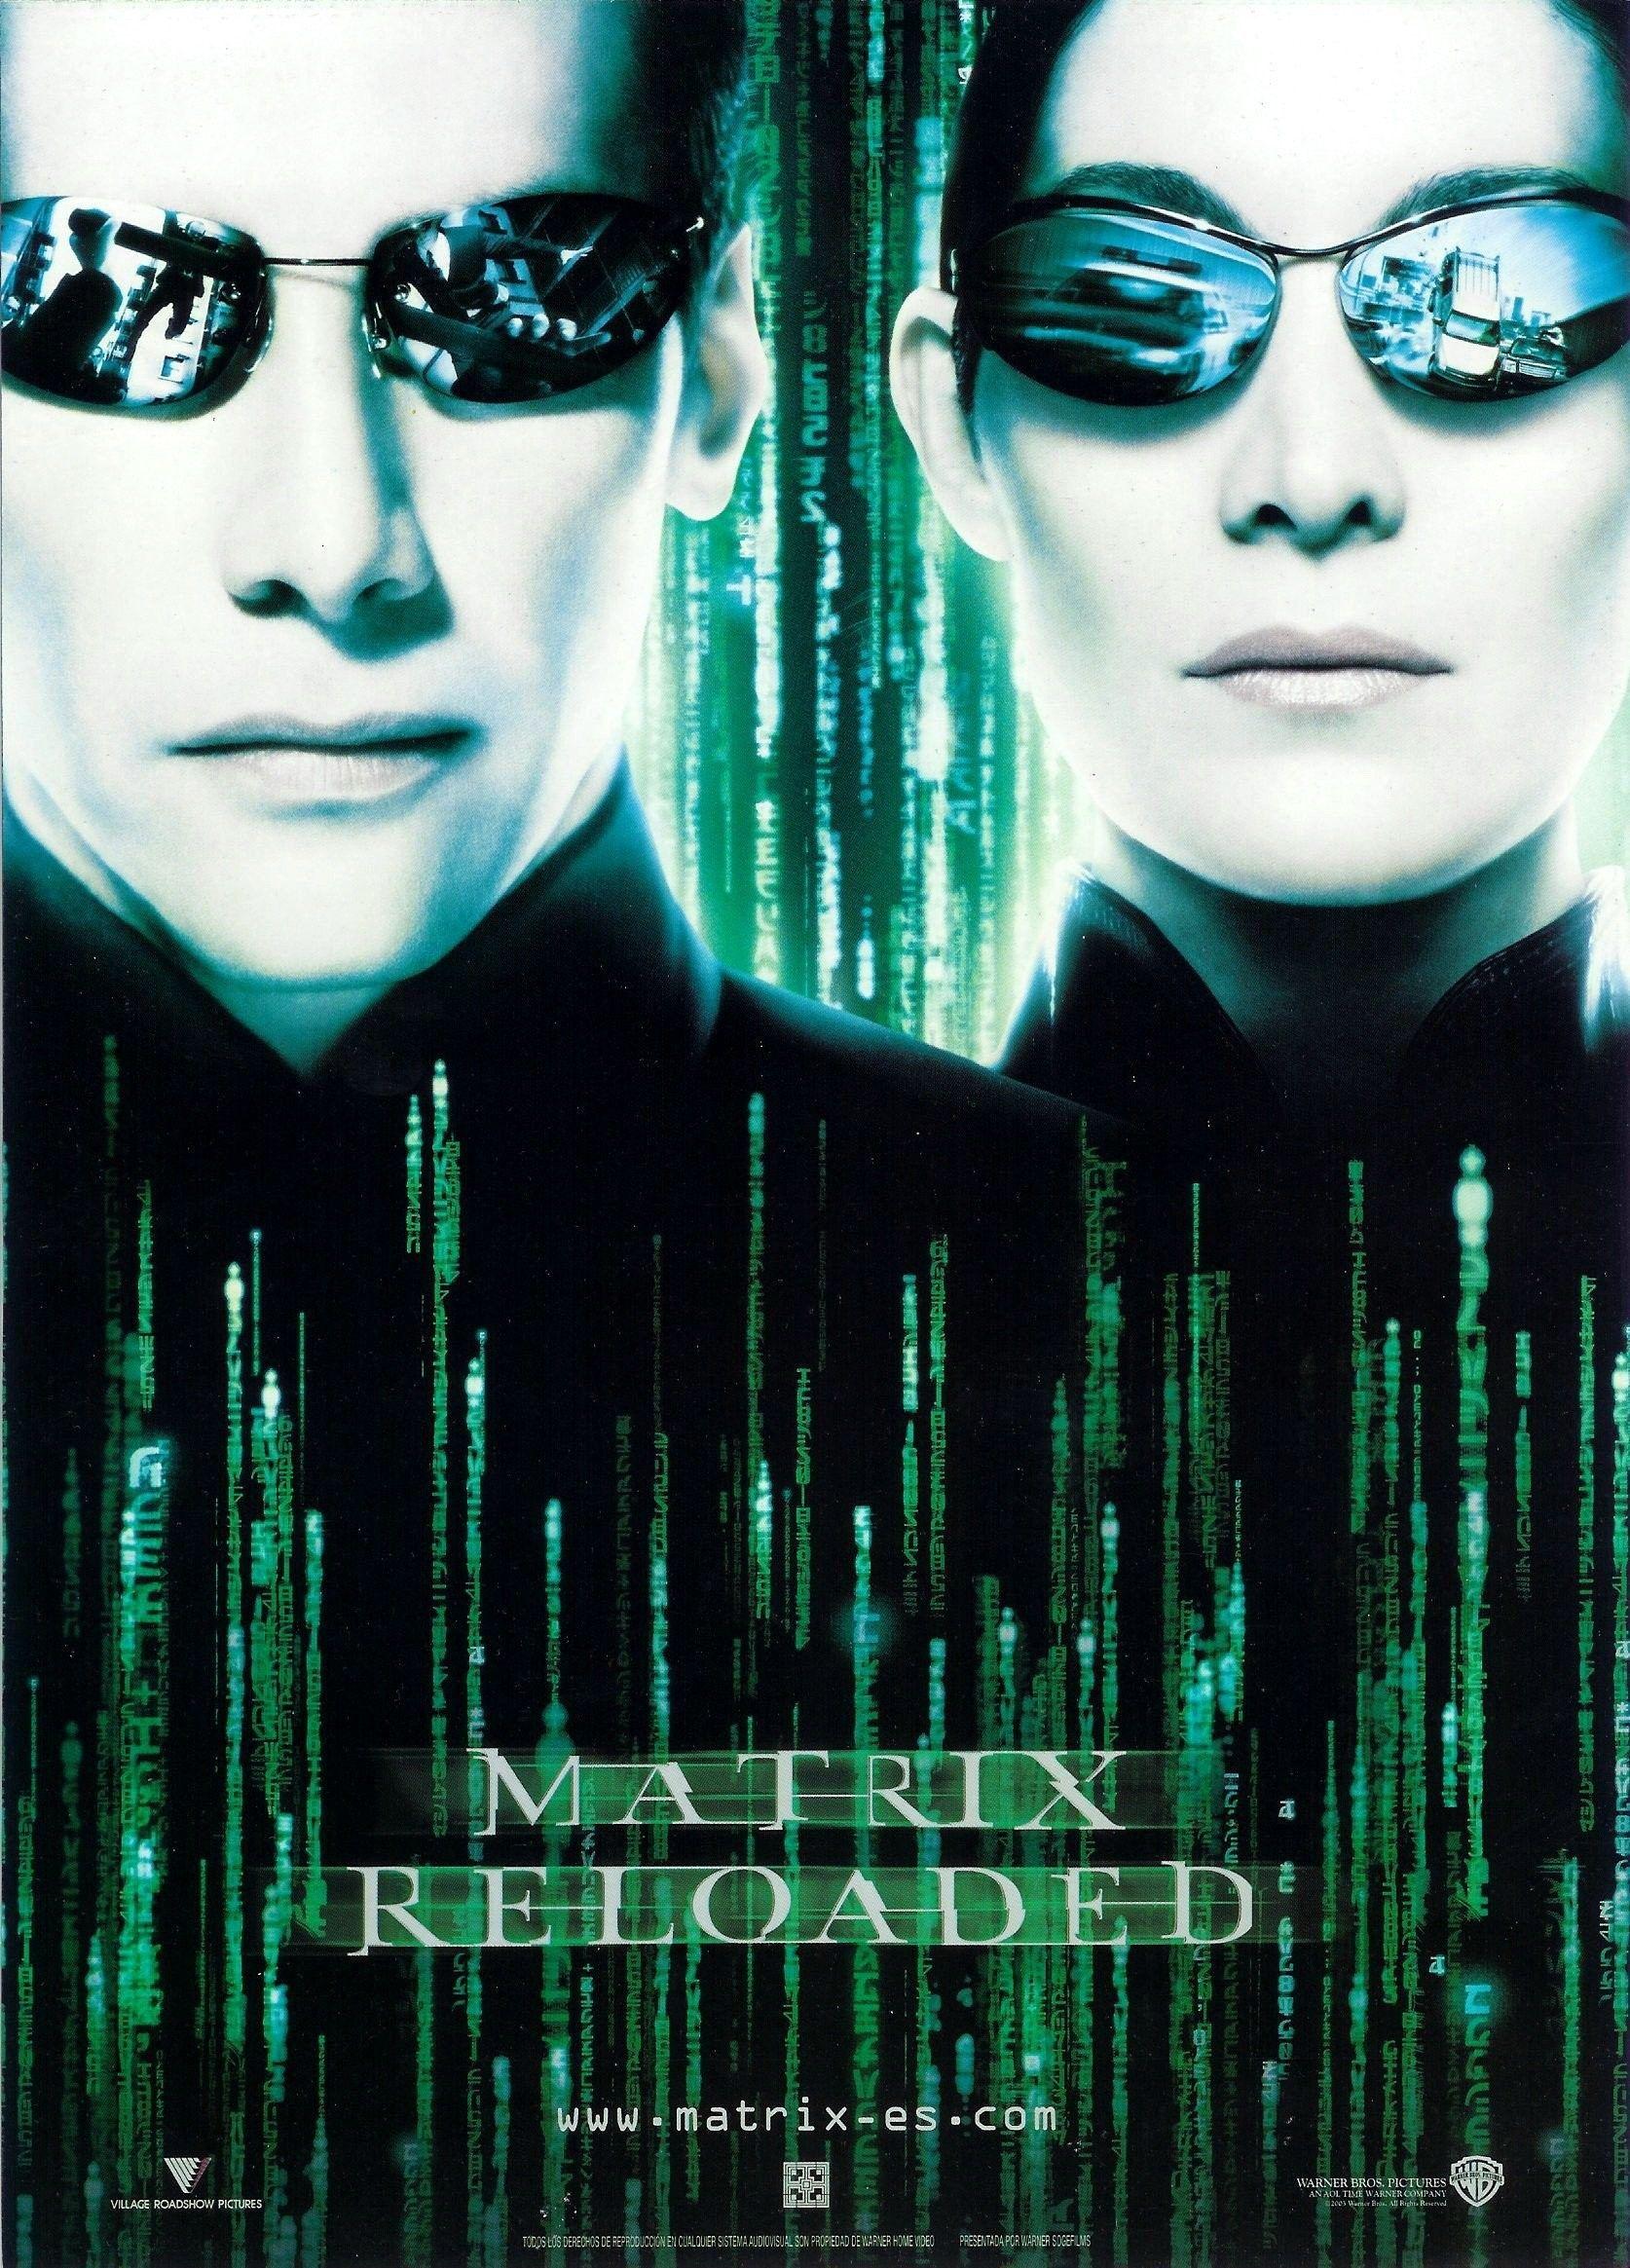 Ver The Matrix Reloaded Online Gratis 2003 Hd Película Completa Español The Matrix Movie Matrix Reloaded Movie Posters